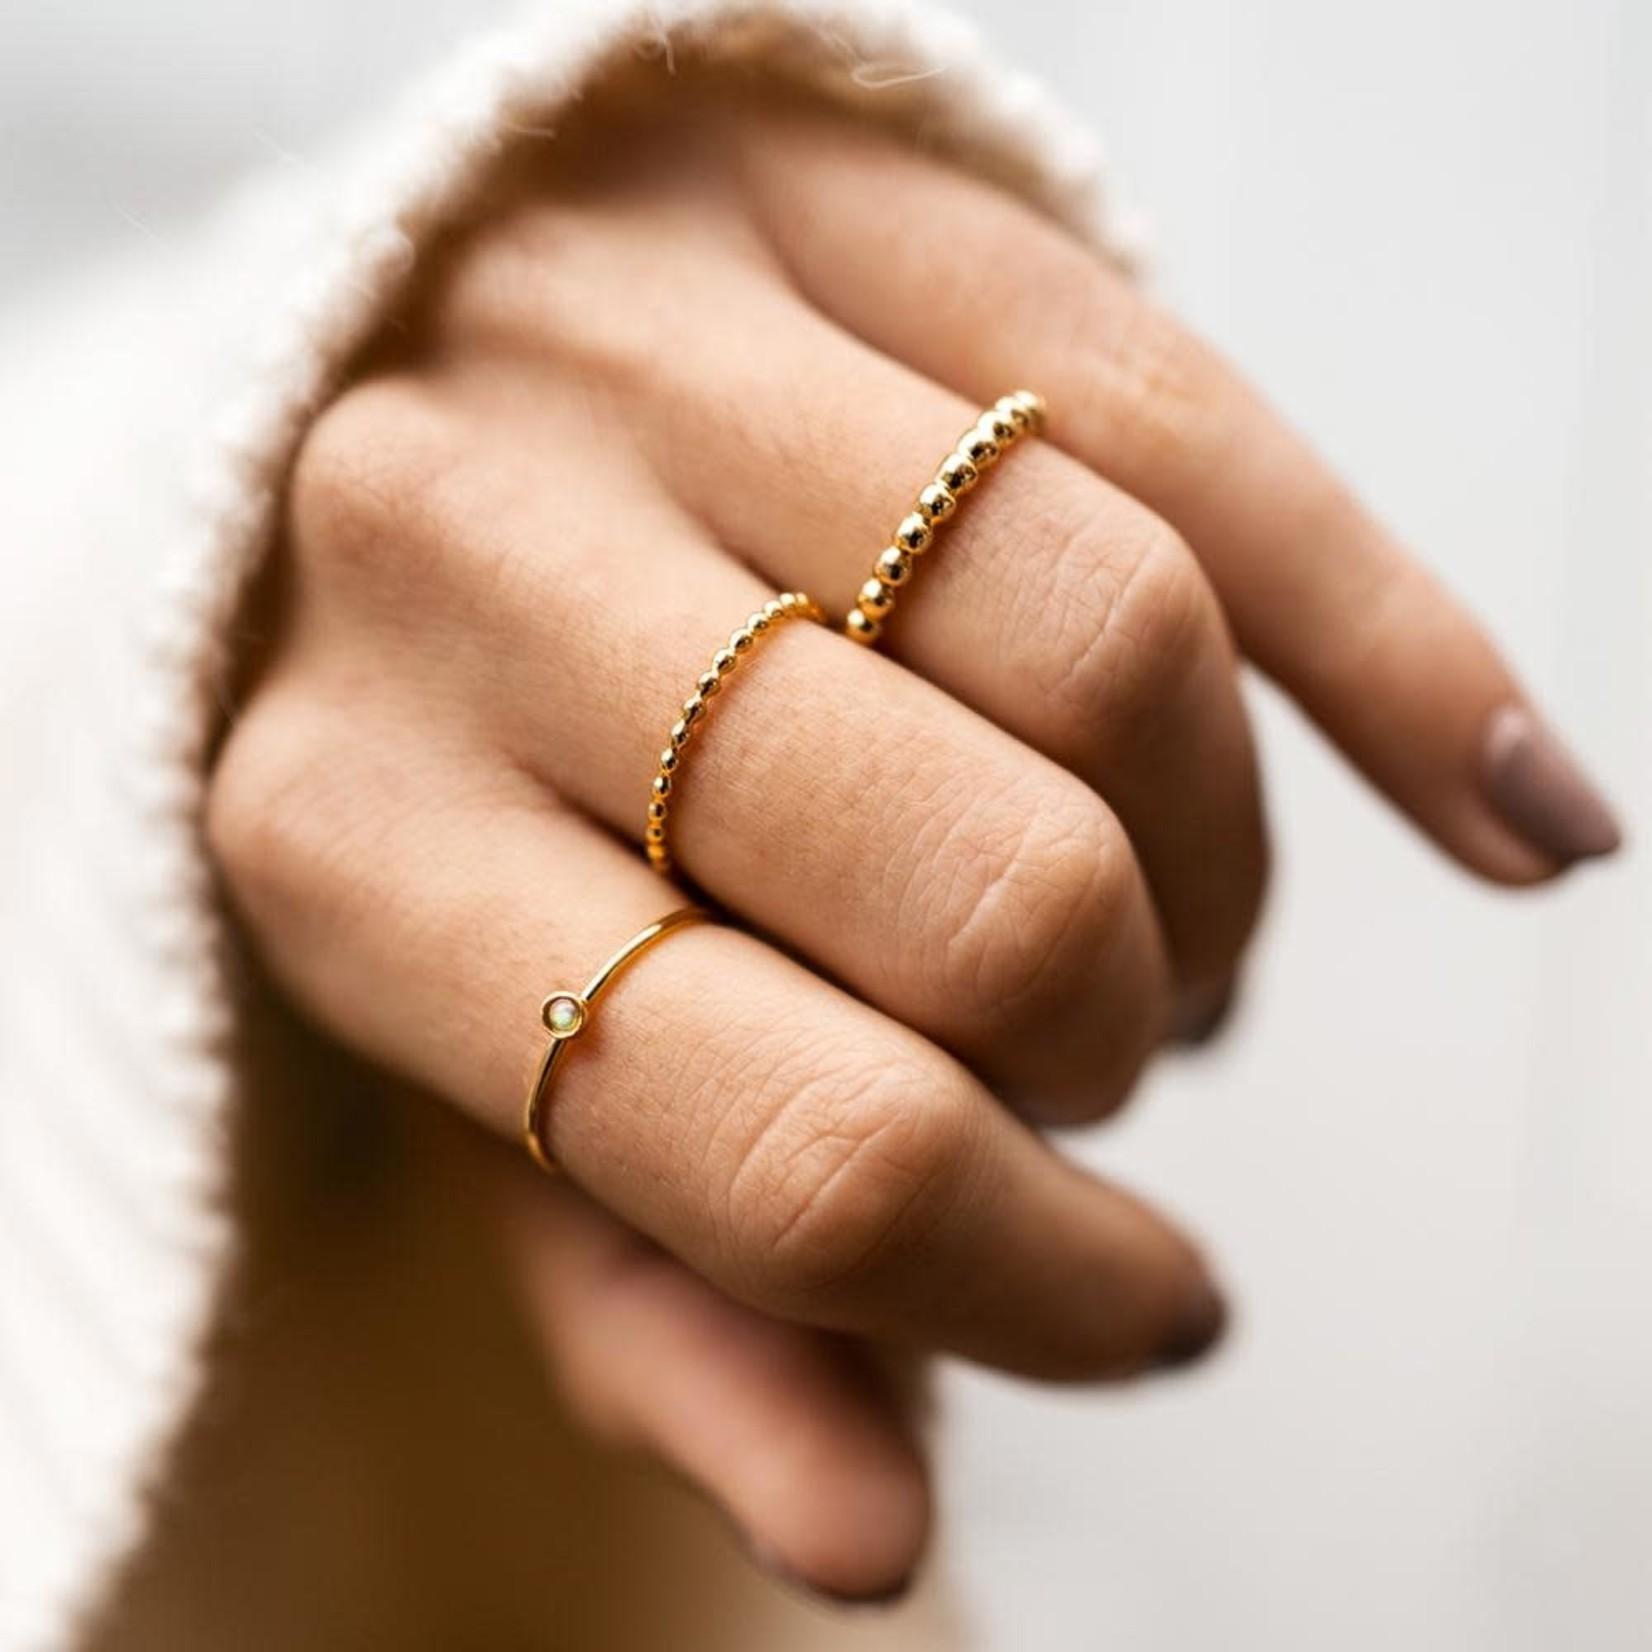 Welldunn jewelry Welldunn bague PERLOCK or